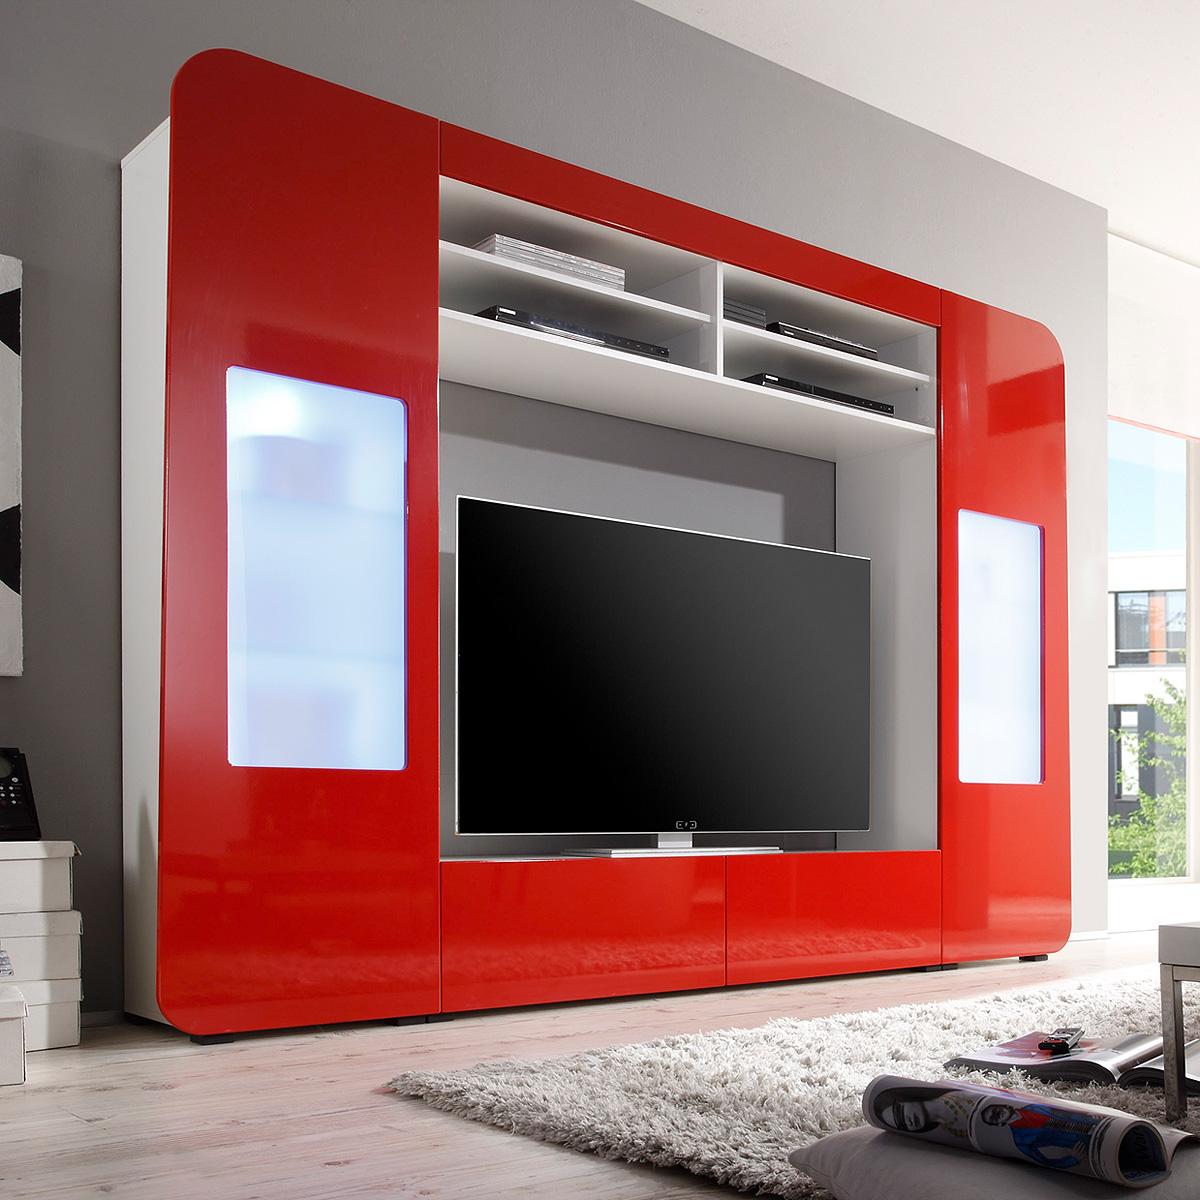 mediawand kino 2 wohnwand anbauwand mit led in hochglanz wei rot oder schwarz. Black Bedroom Furniture Sets. Home Design Ideas